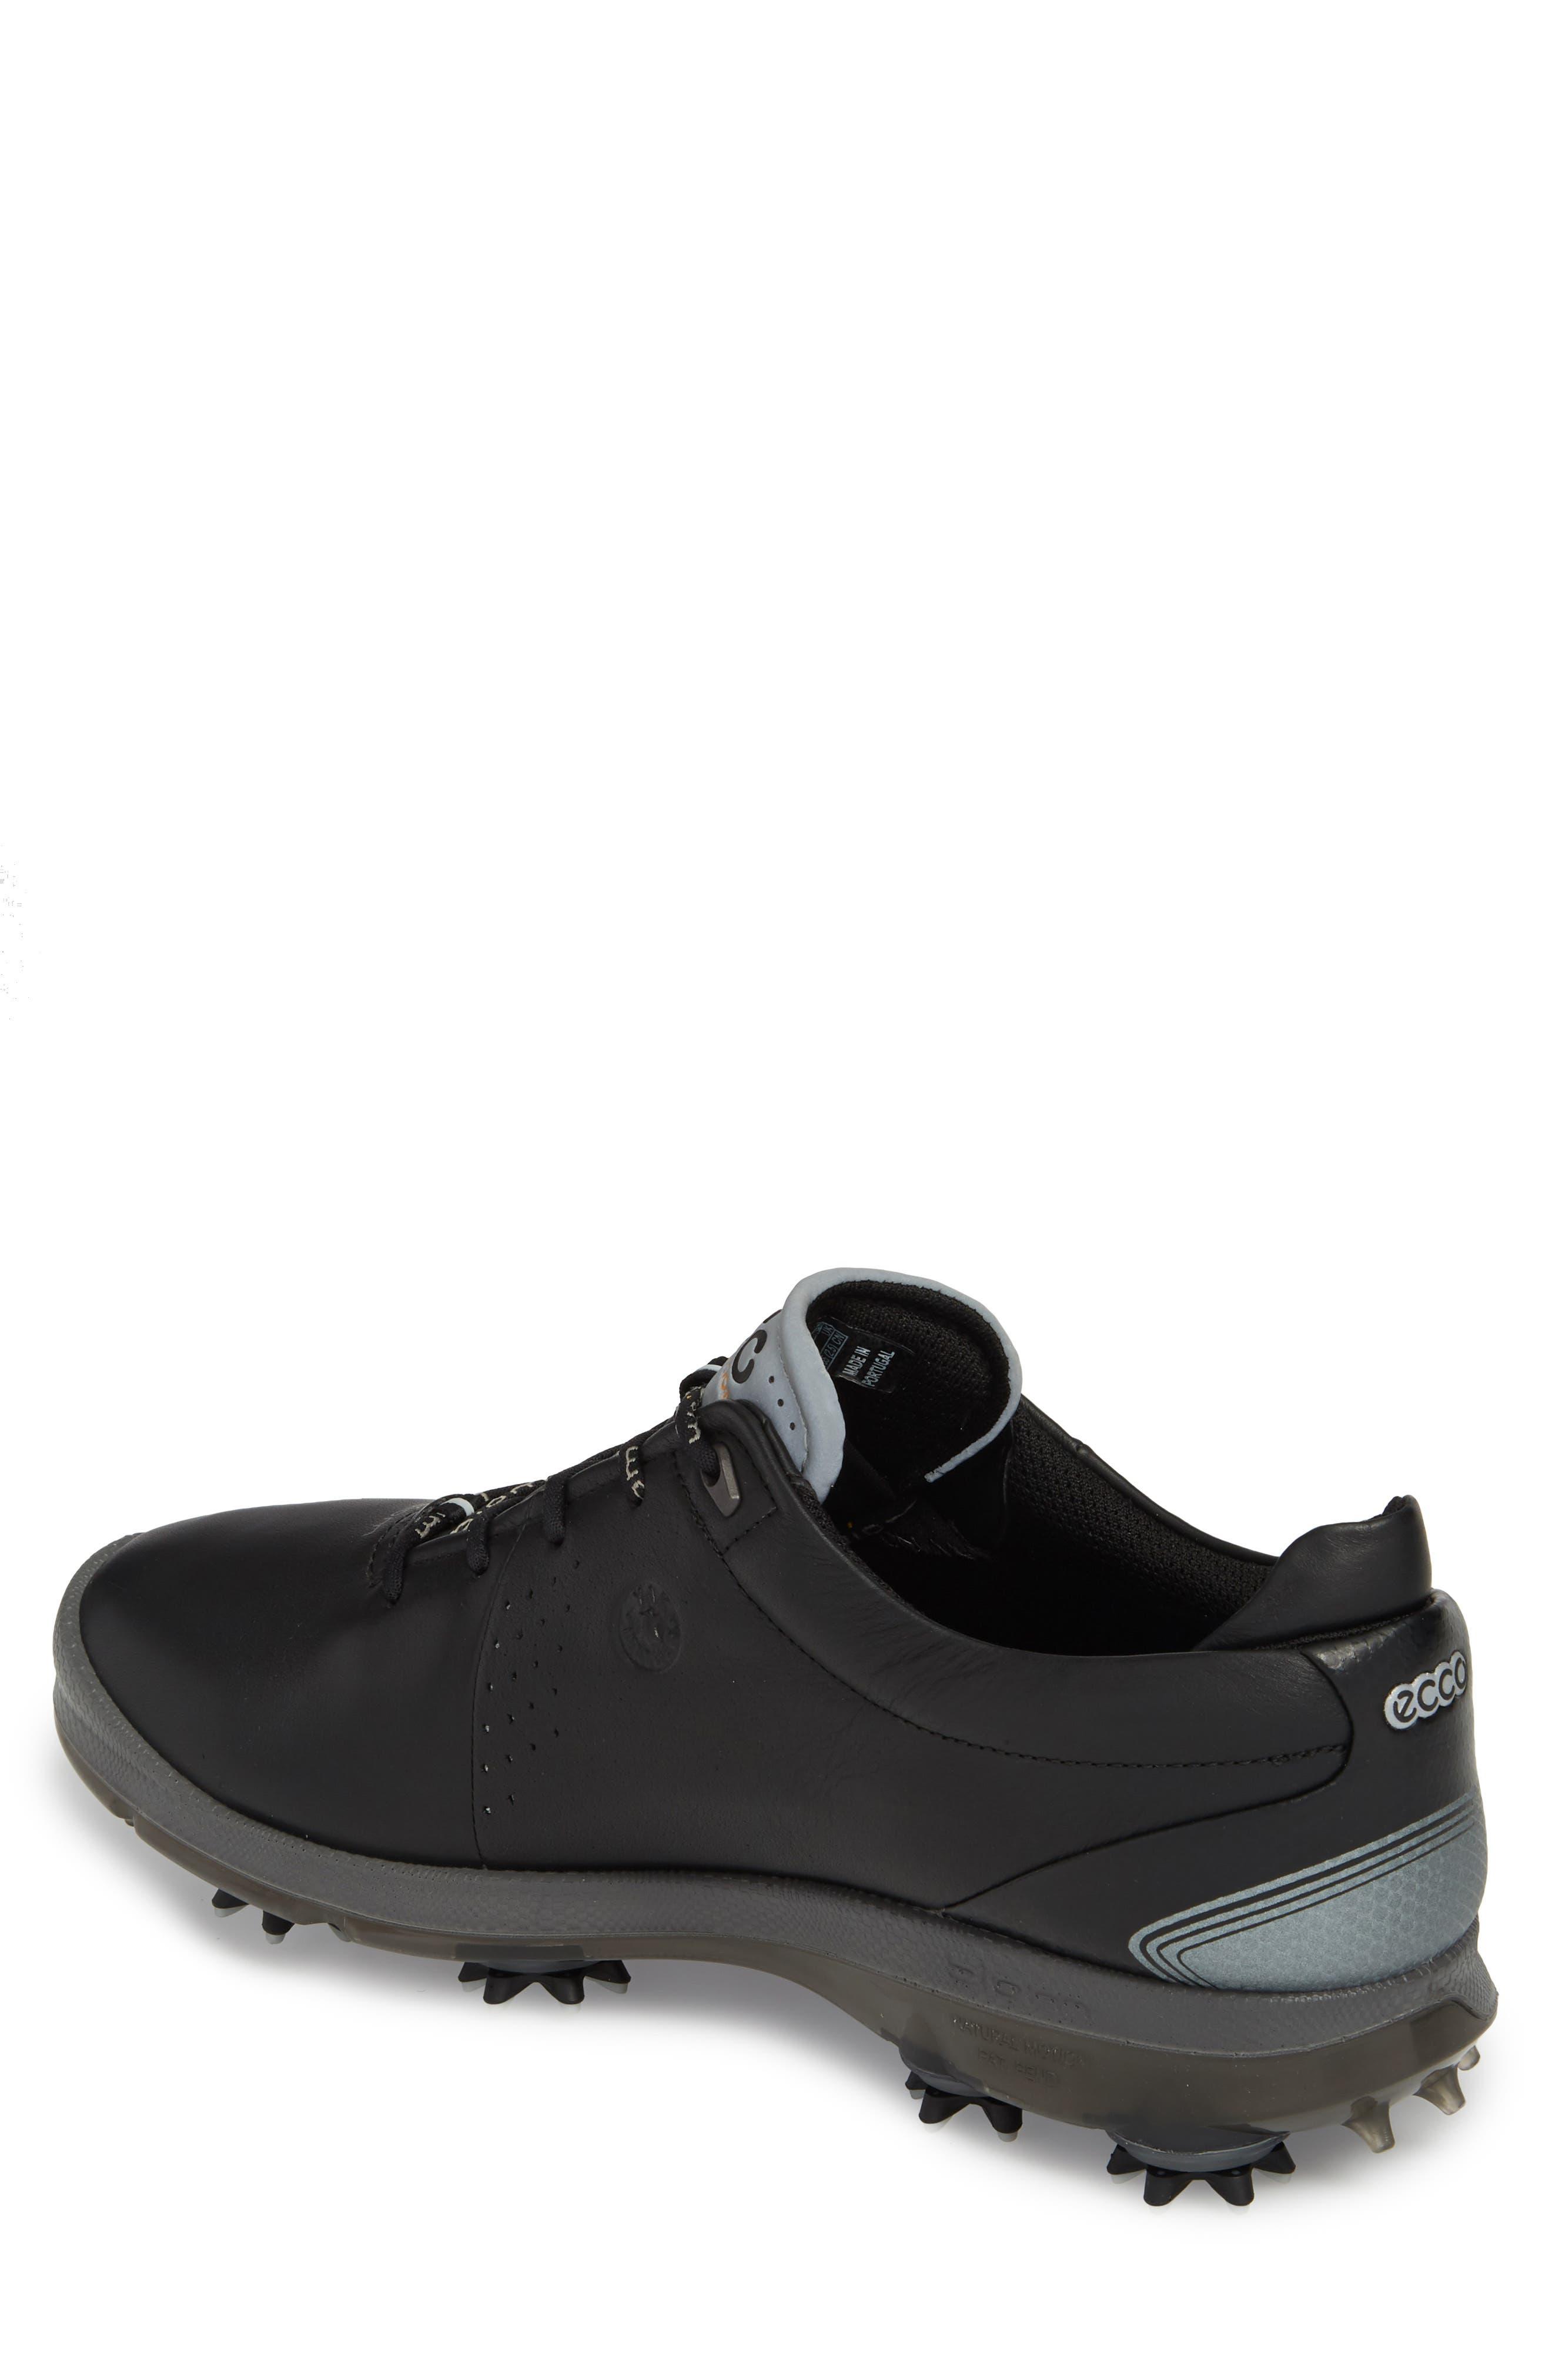 BIOM G 2 Free Gore-Tex<sup>®</sup> Golf Shoe,                             Alternate thumbnail 2, color,                             Black Leather